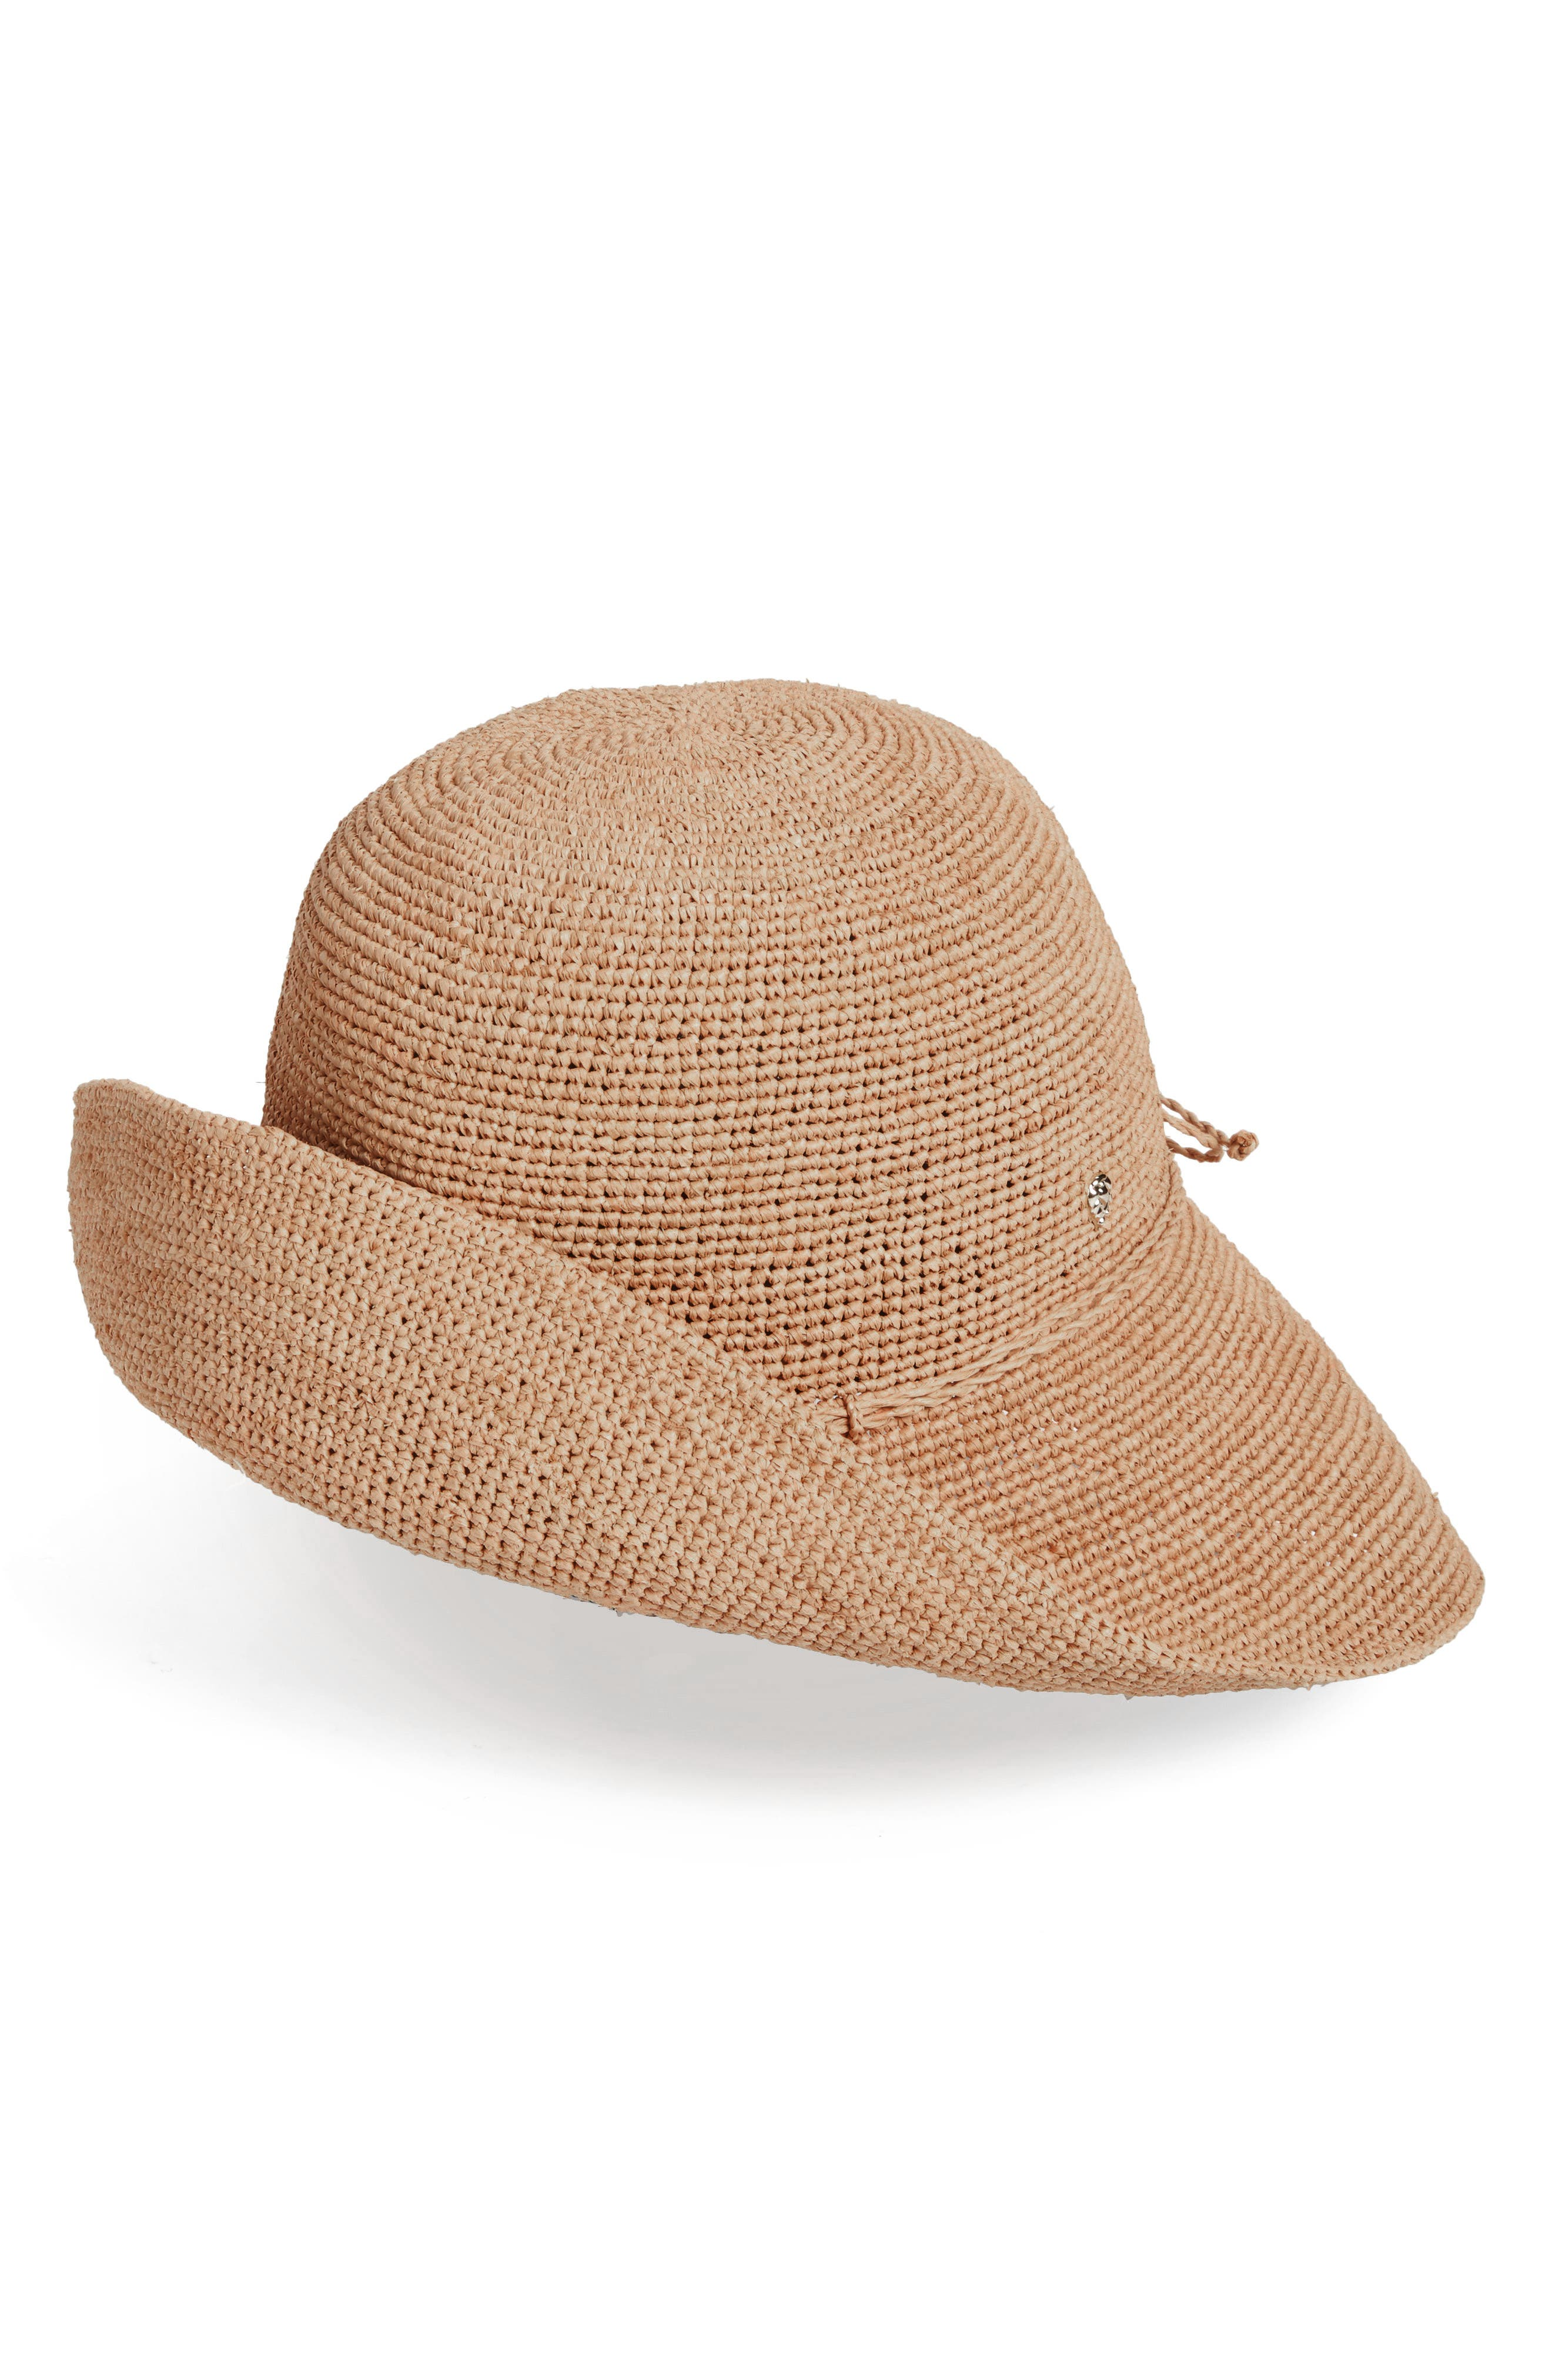 Alternate Image 1 Selected - Helen Kaminski 'Provence 10' Packable Raffia Hat